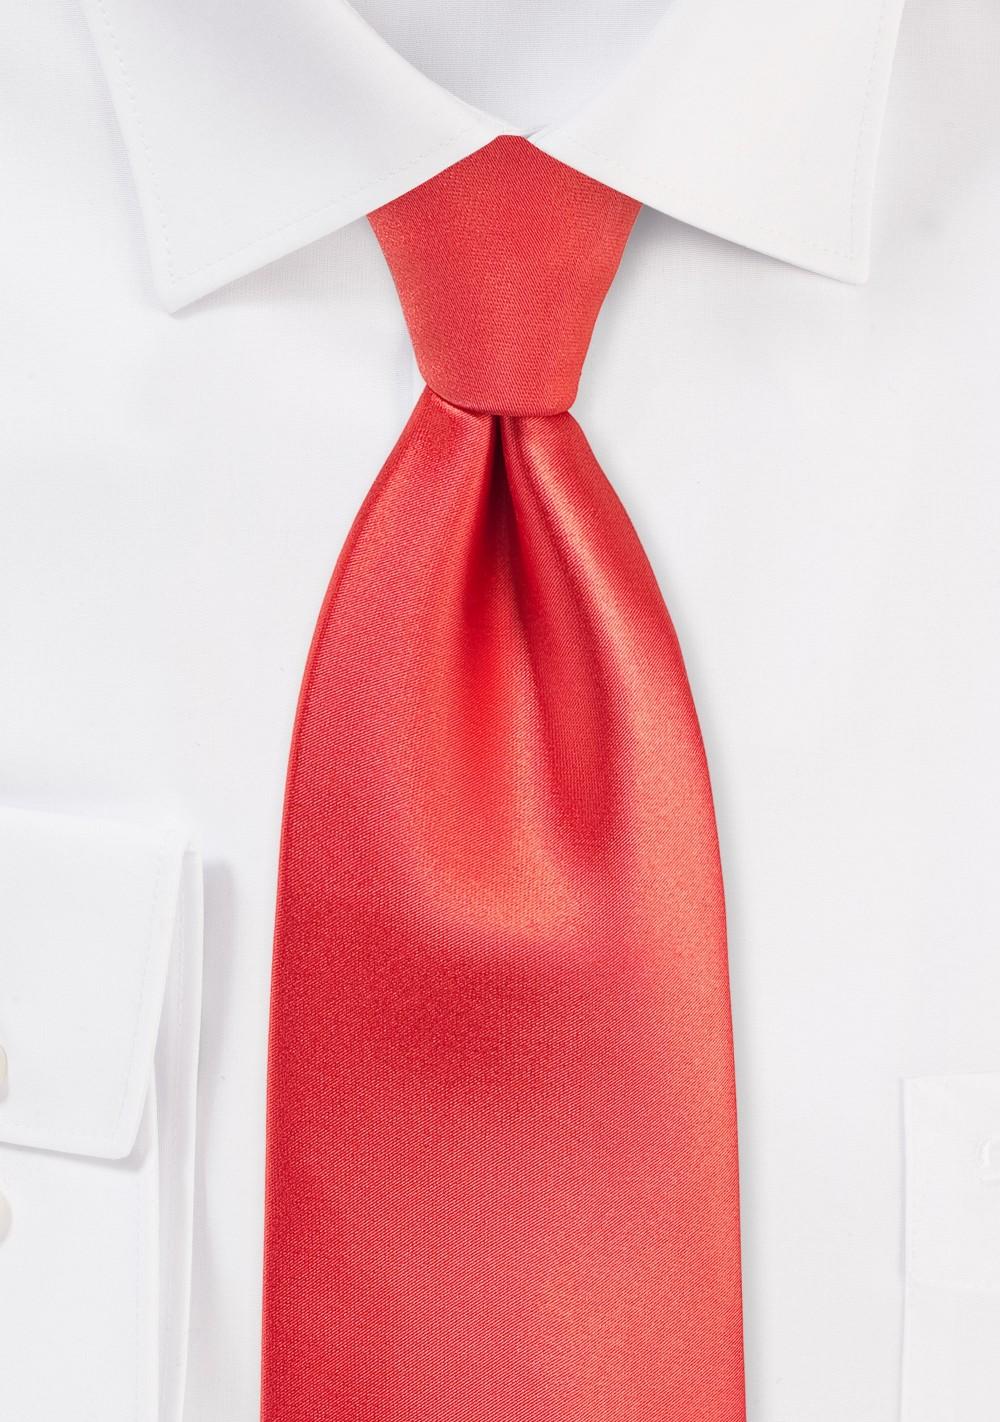 Neon Coral Colored Kids Tie